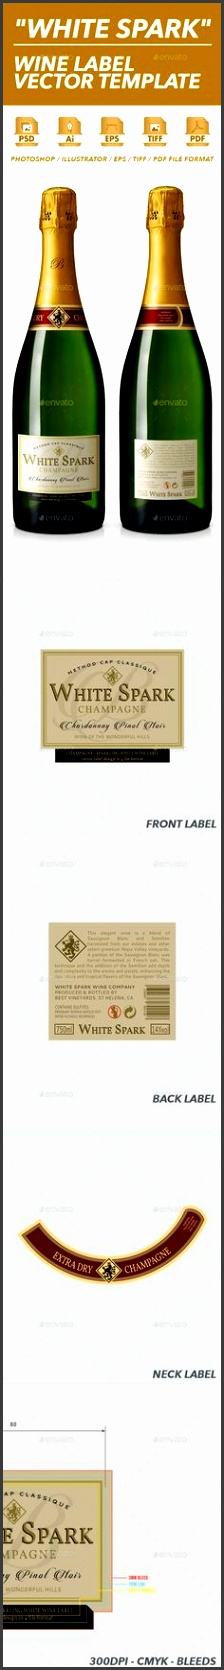 28a293ccb2abdfd3cae66f5ecff0add1 label templates print templates